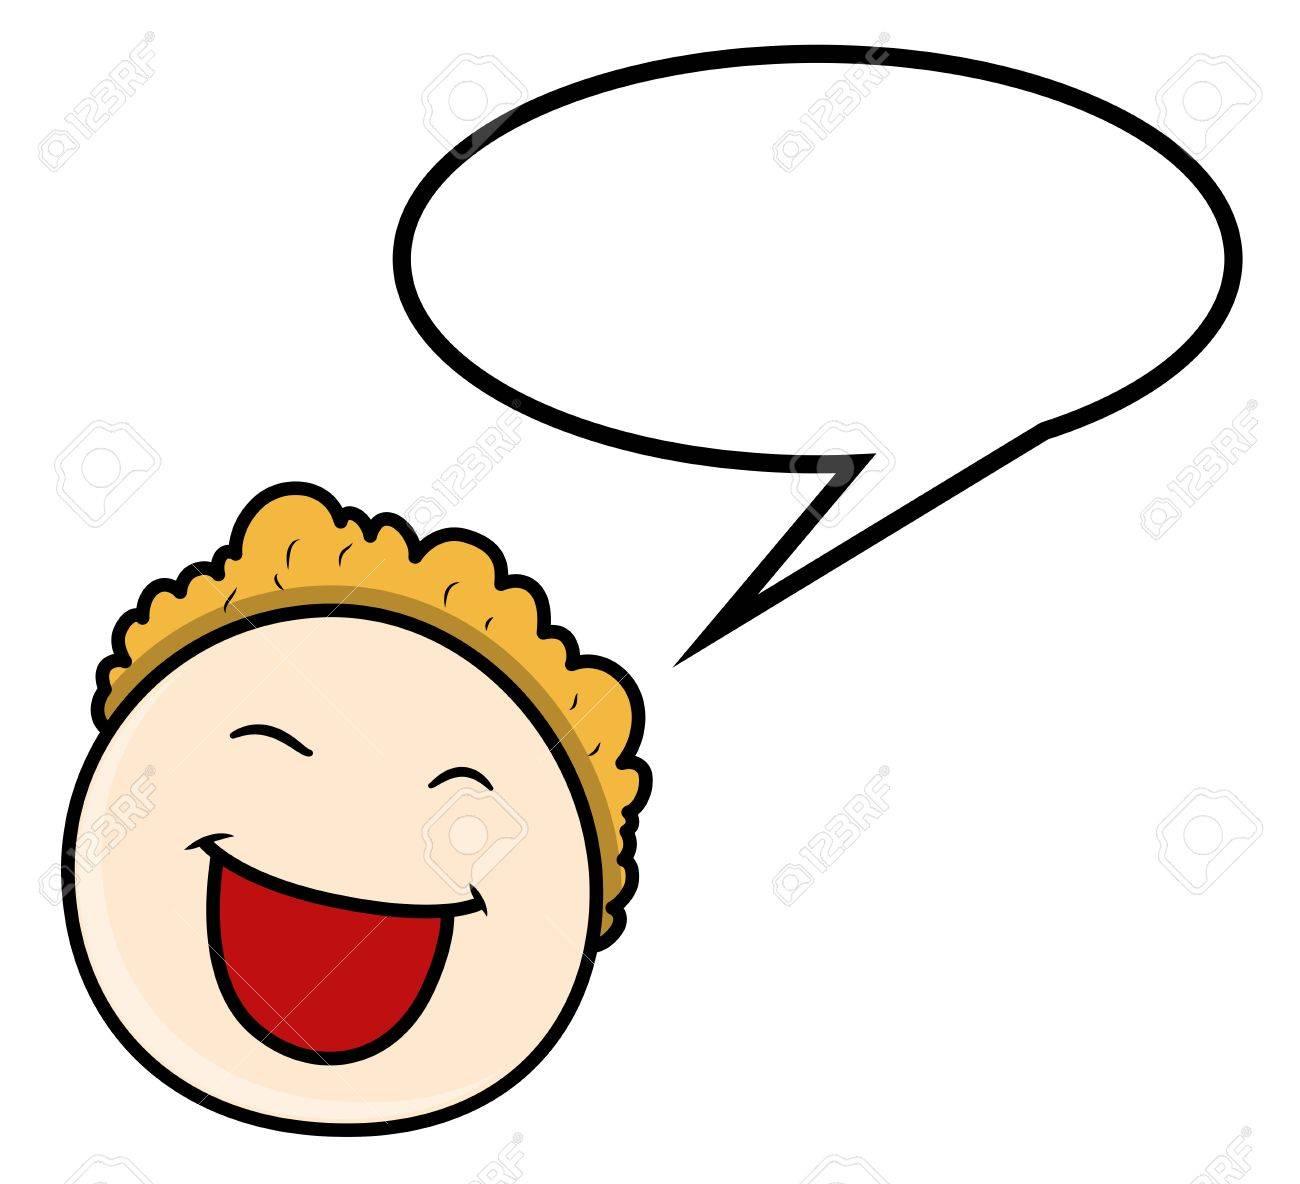 Cartoon Boy - Speech Bubble - Vector Illustrations - 21098327